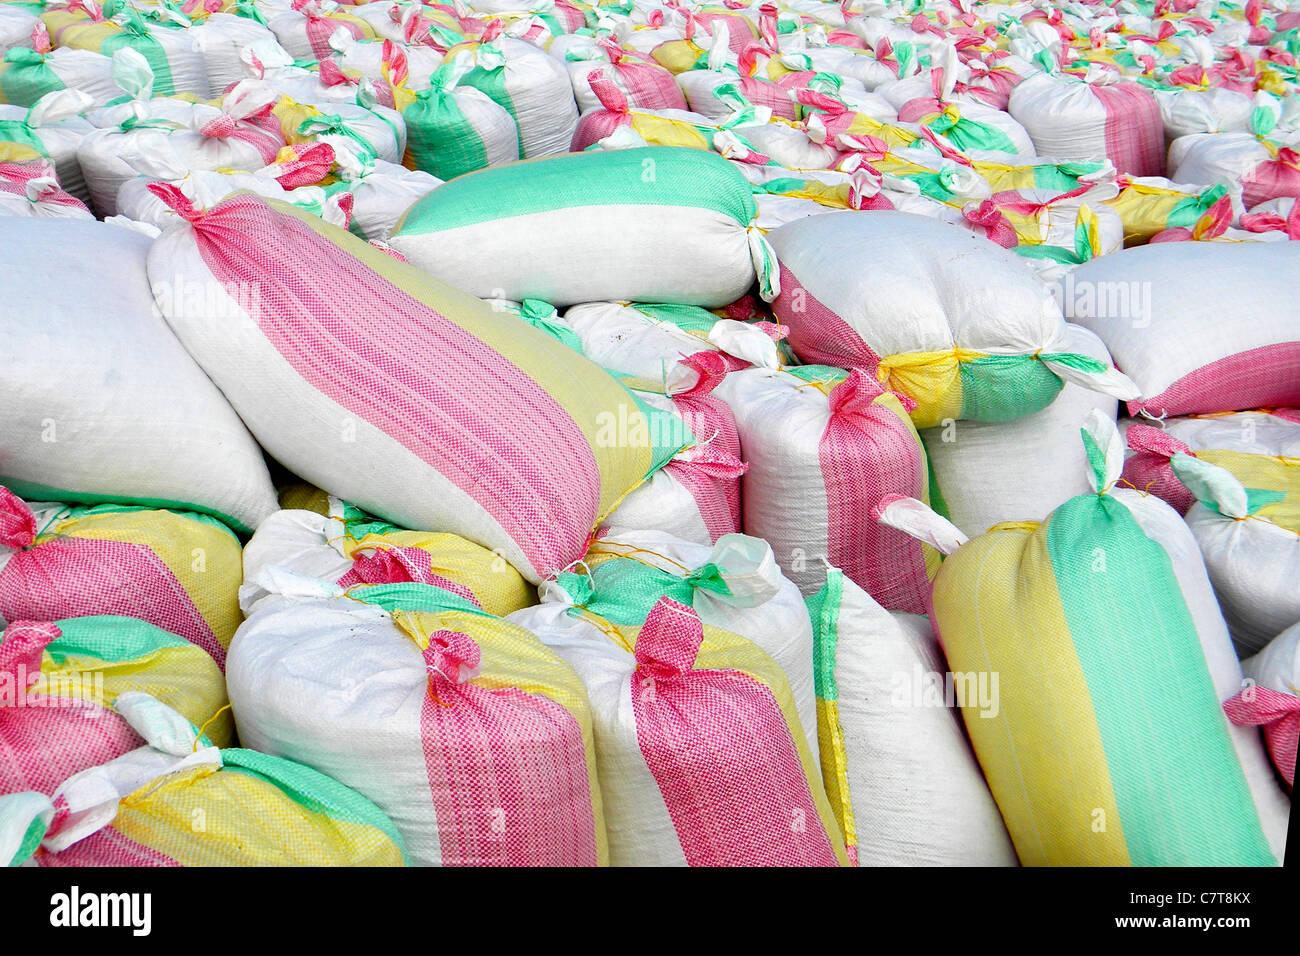 Stacked sacks - Stock Image